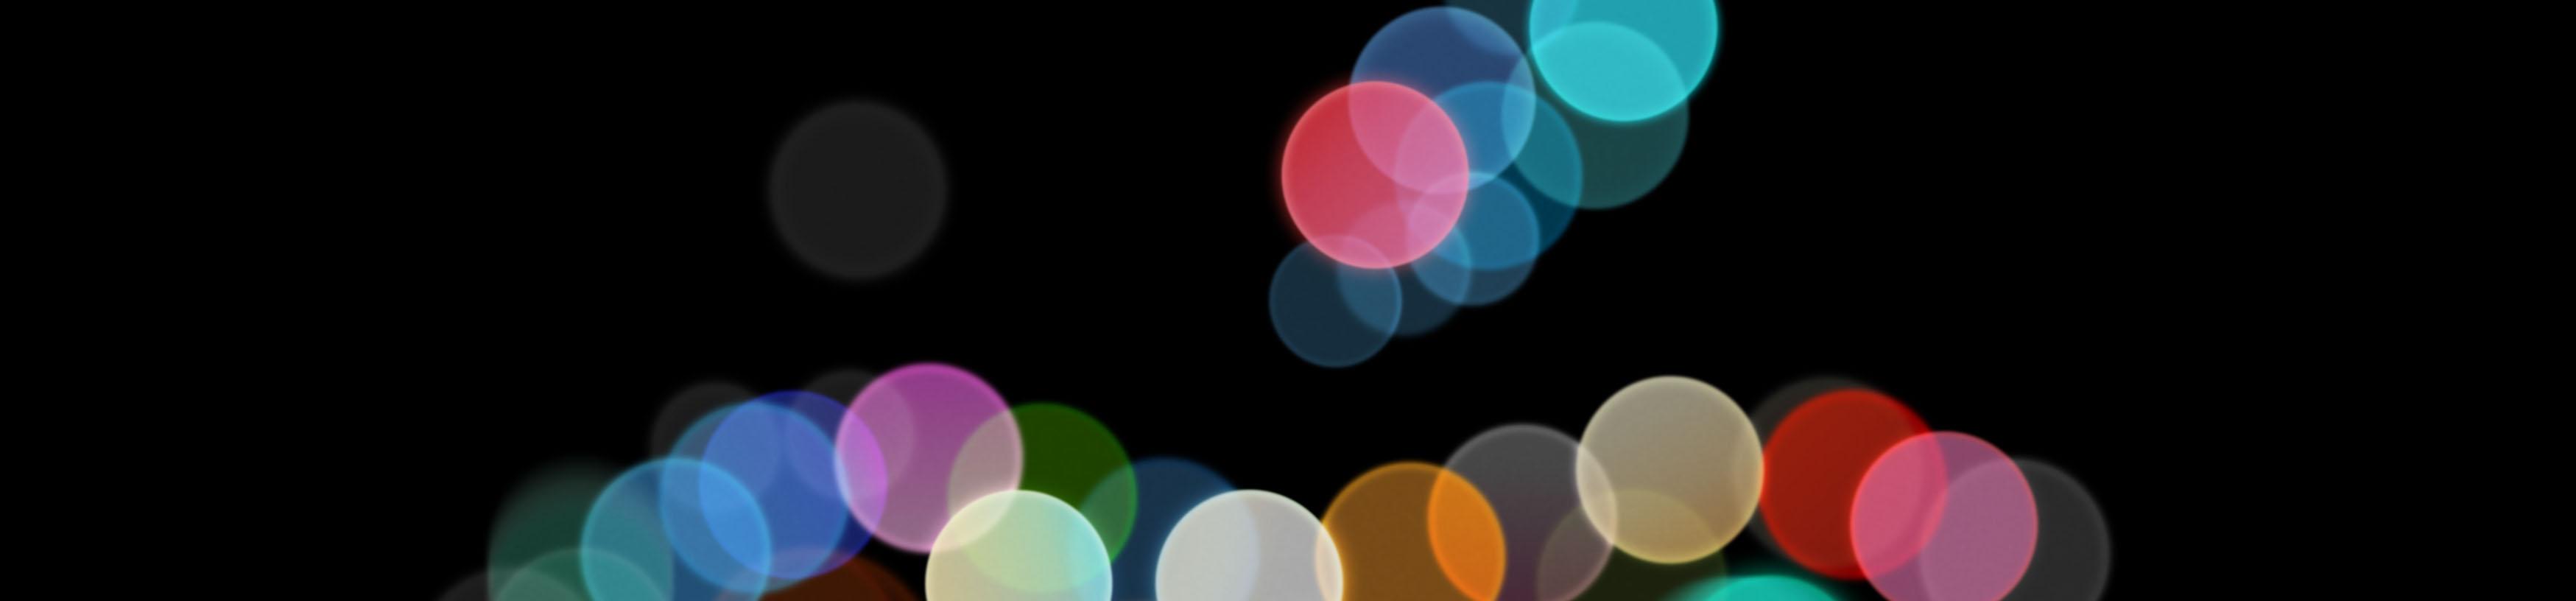 「iPhone 7」&「Apple Watch Series 2」特集